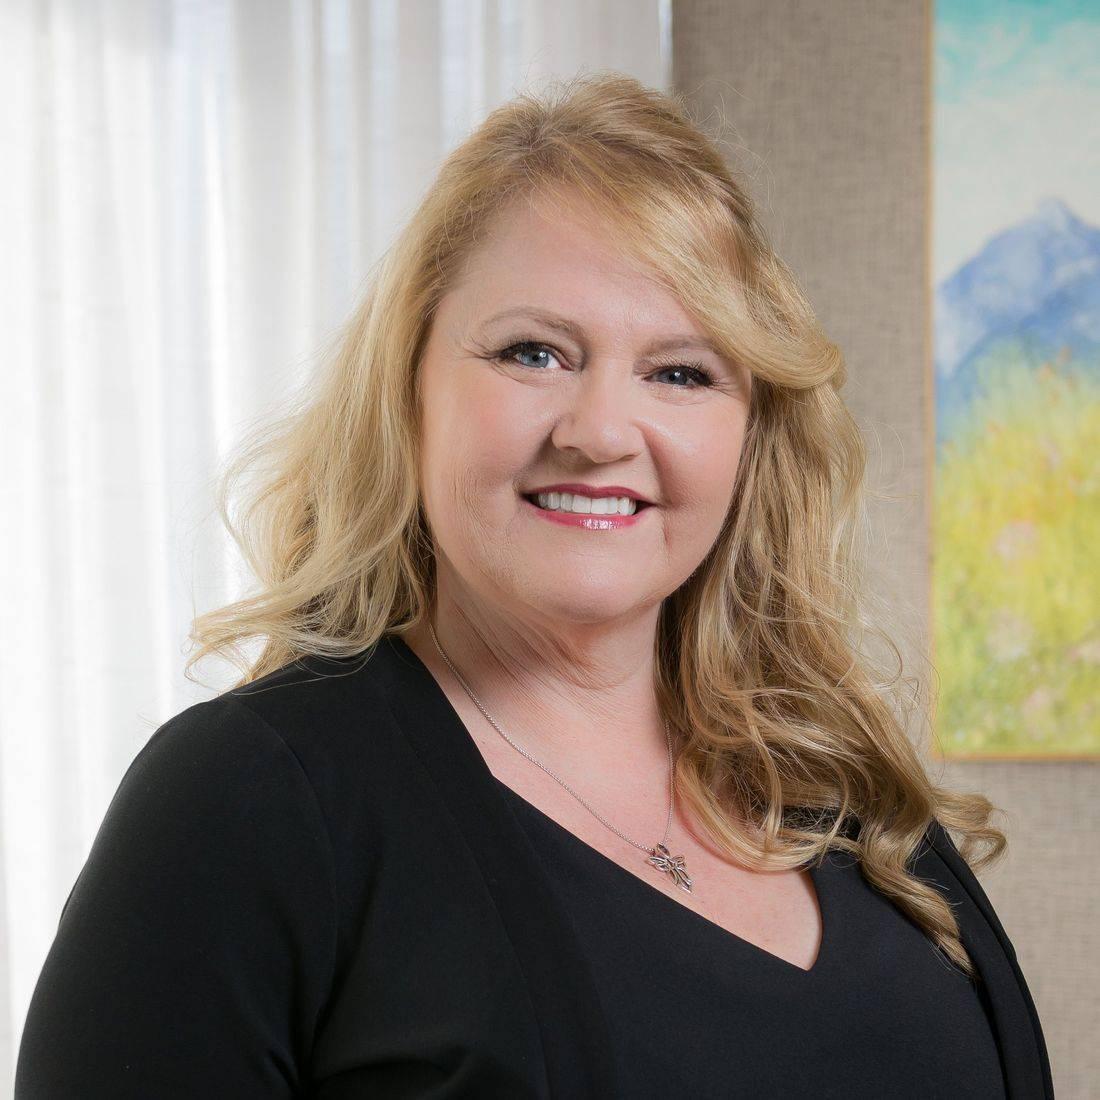 Victoria Johnson Heal Your Life Training Canada